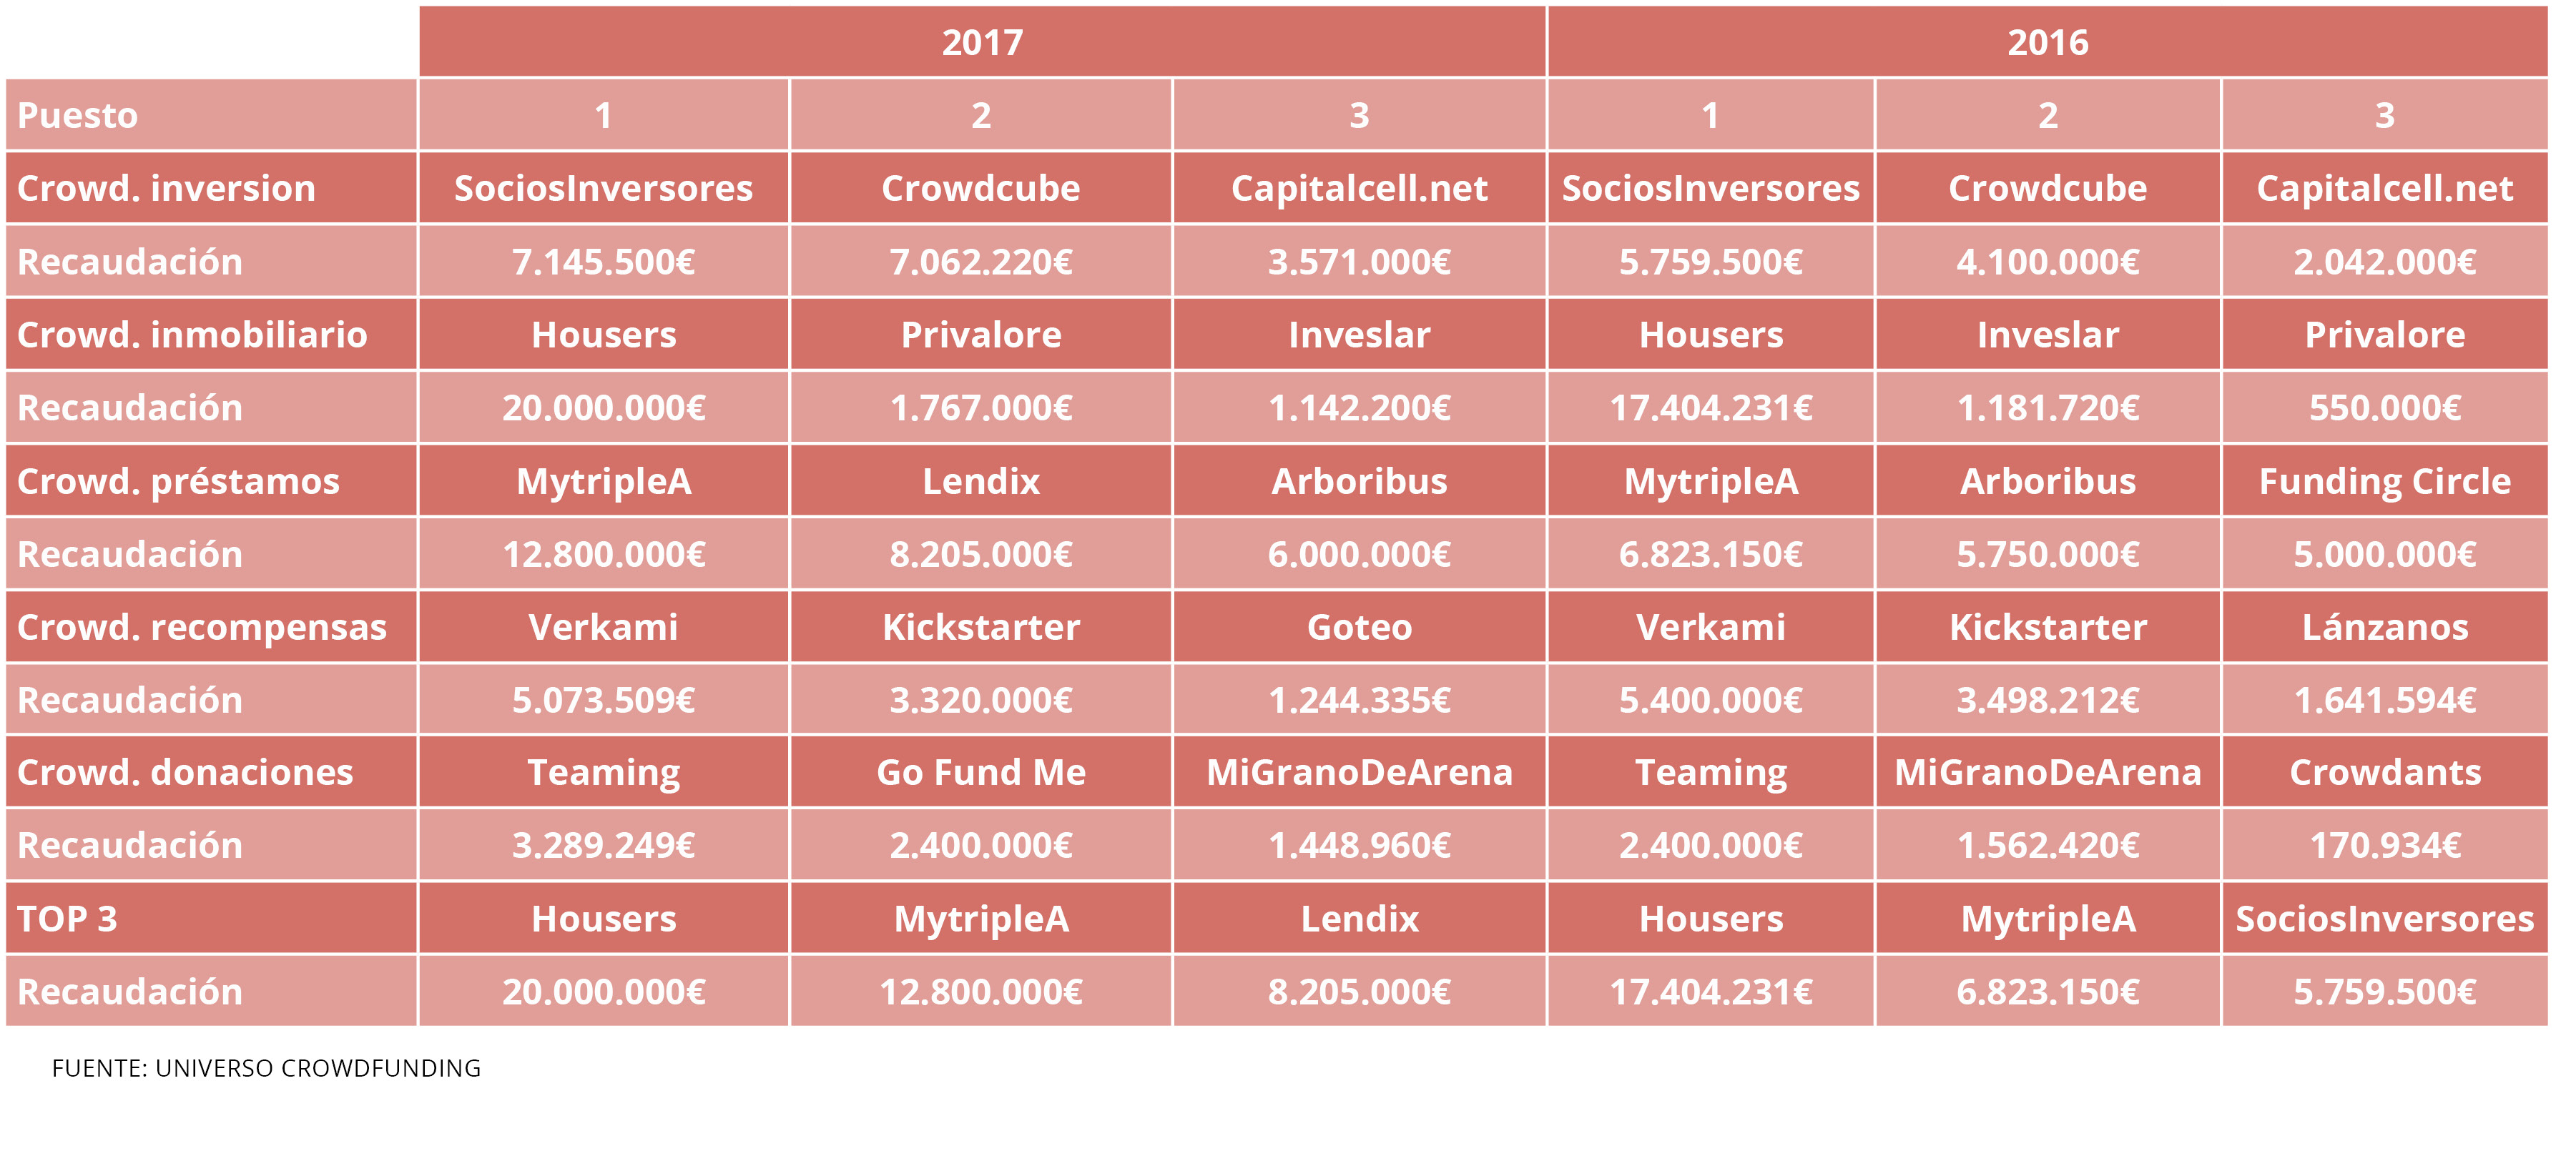 tabla top 3 crowdfunding en españa Housers